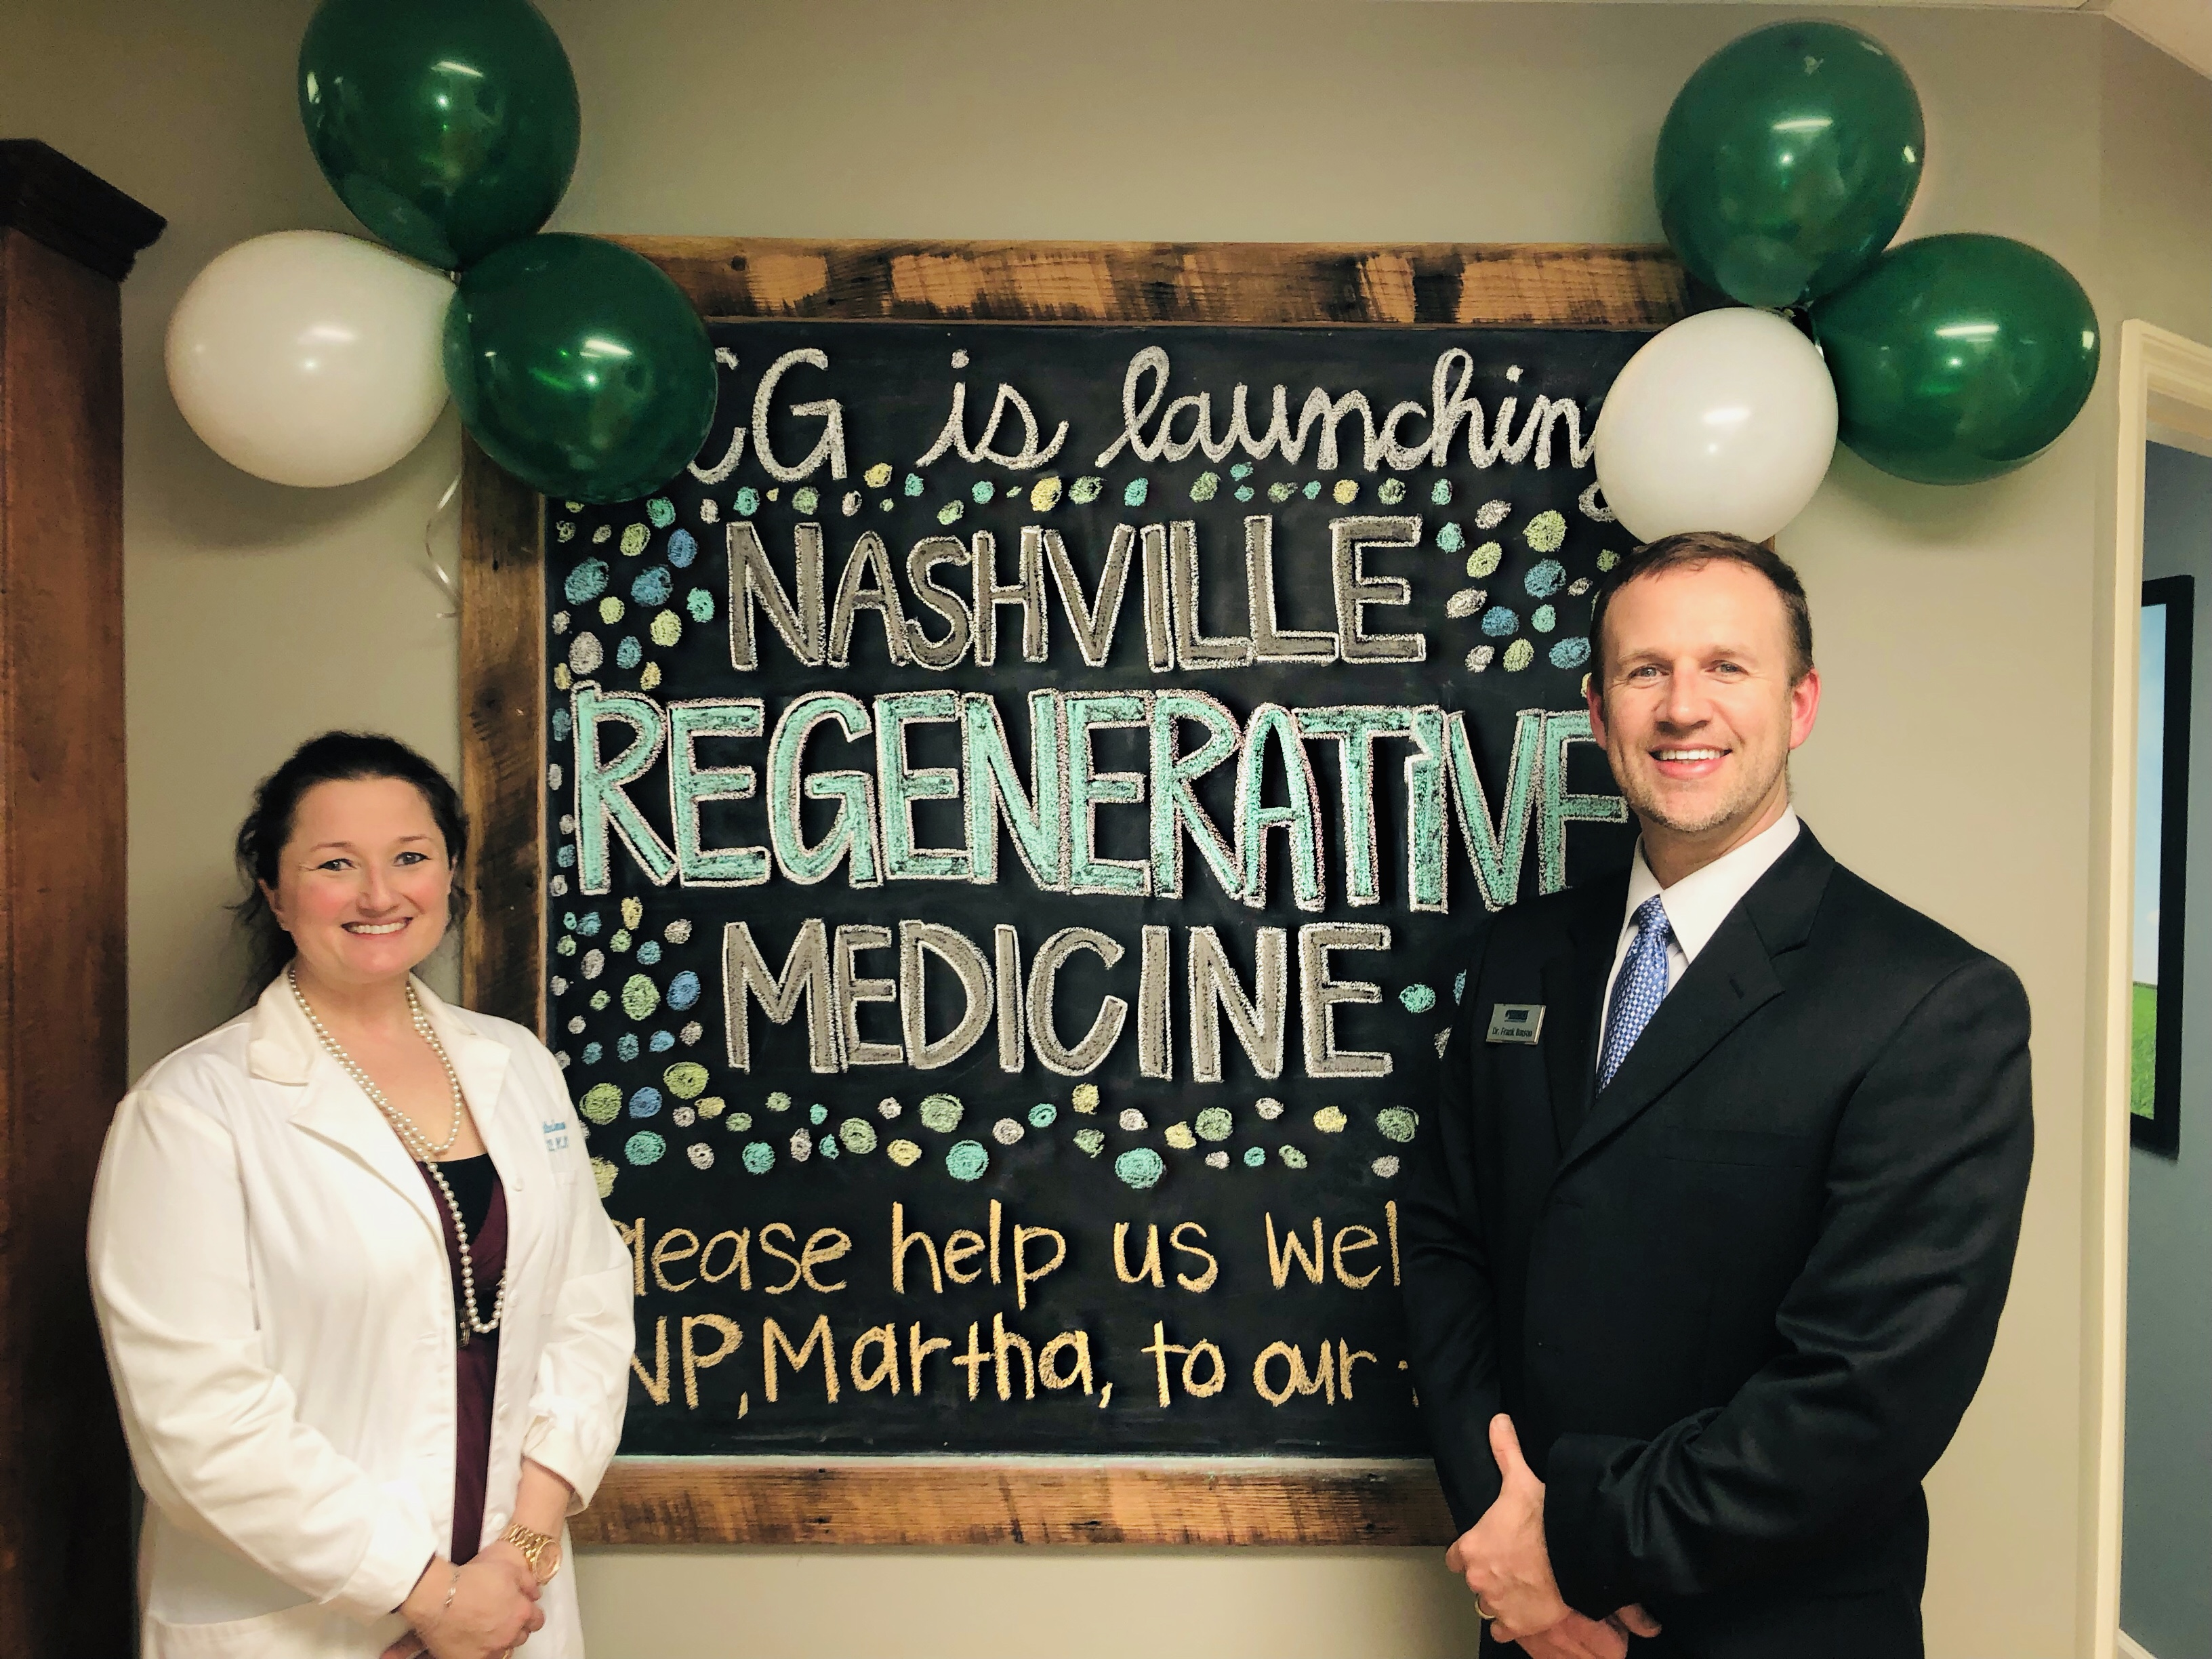 regenerative medicine event